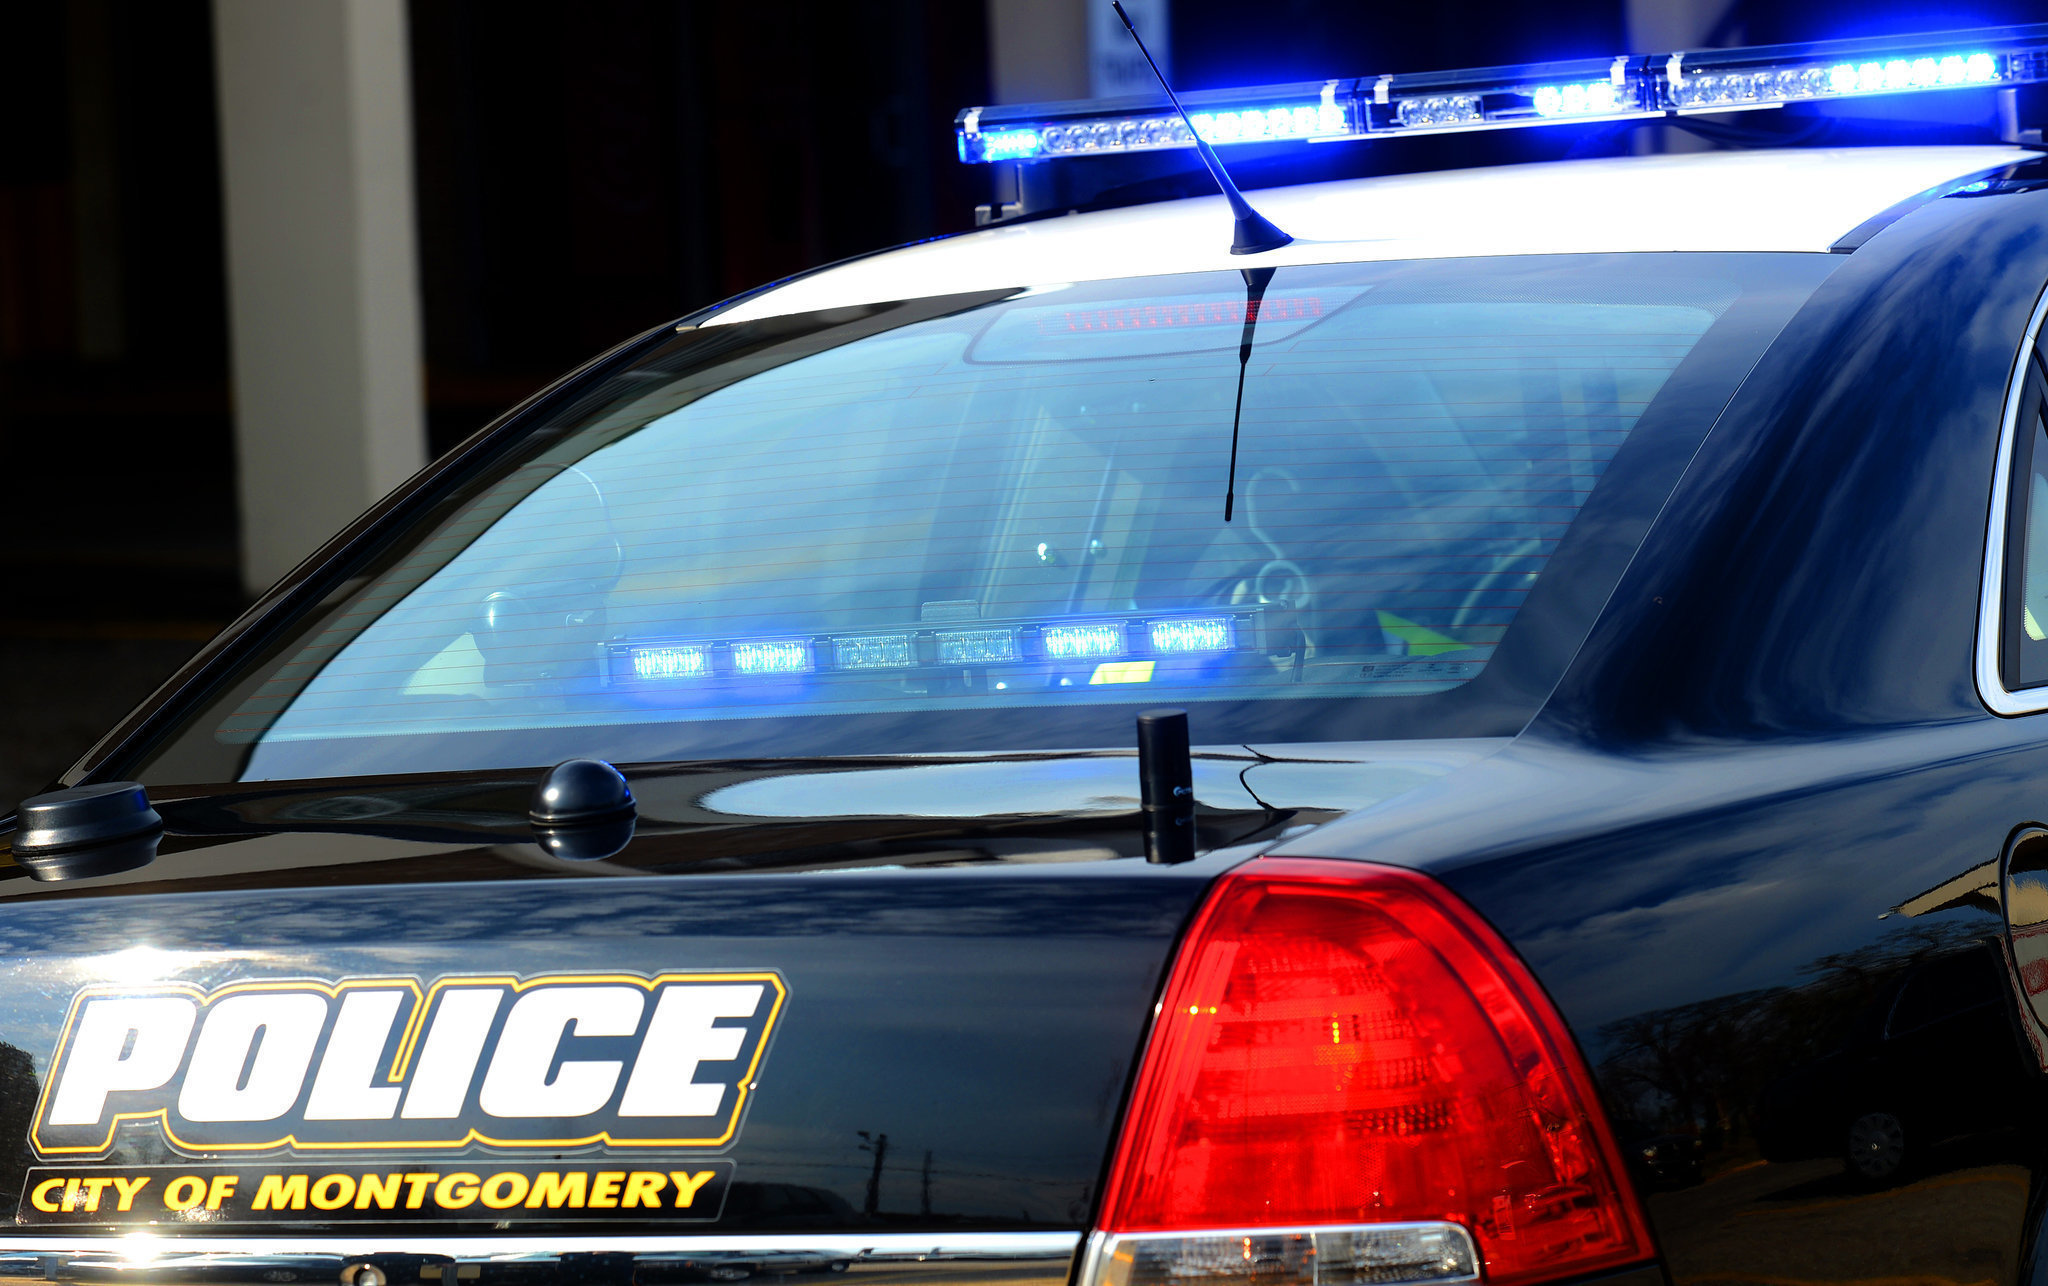 montgomery police id man kille kitchen remodeling montgomery al Julie Bennett jbennett al com JULIE BENNETT Montgomery